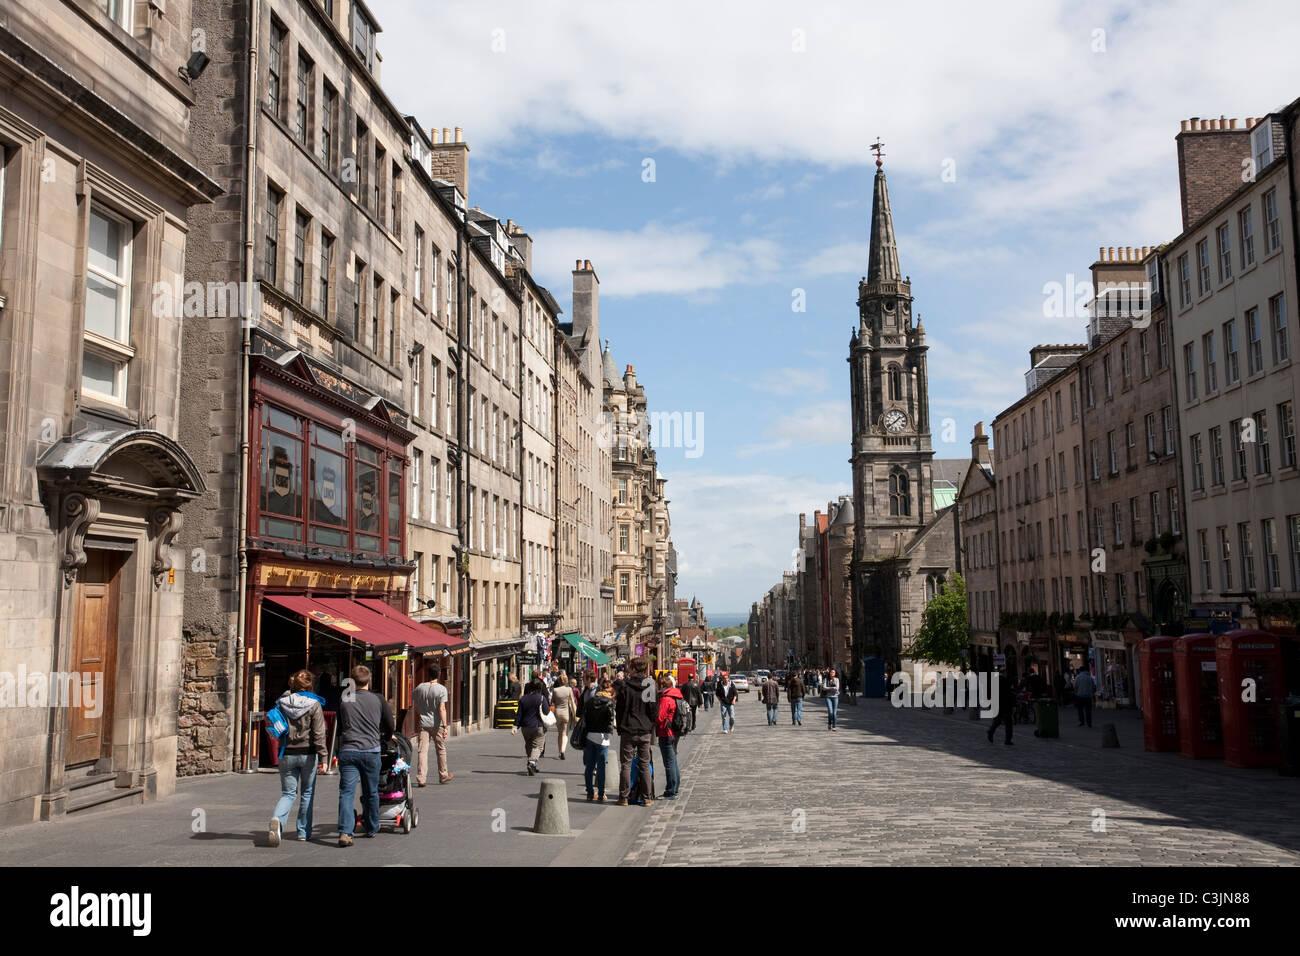 The Royal Mile, Edinburgh, Scotland - Stock Image